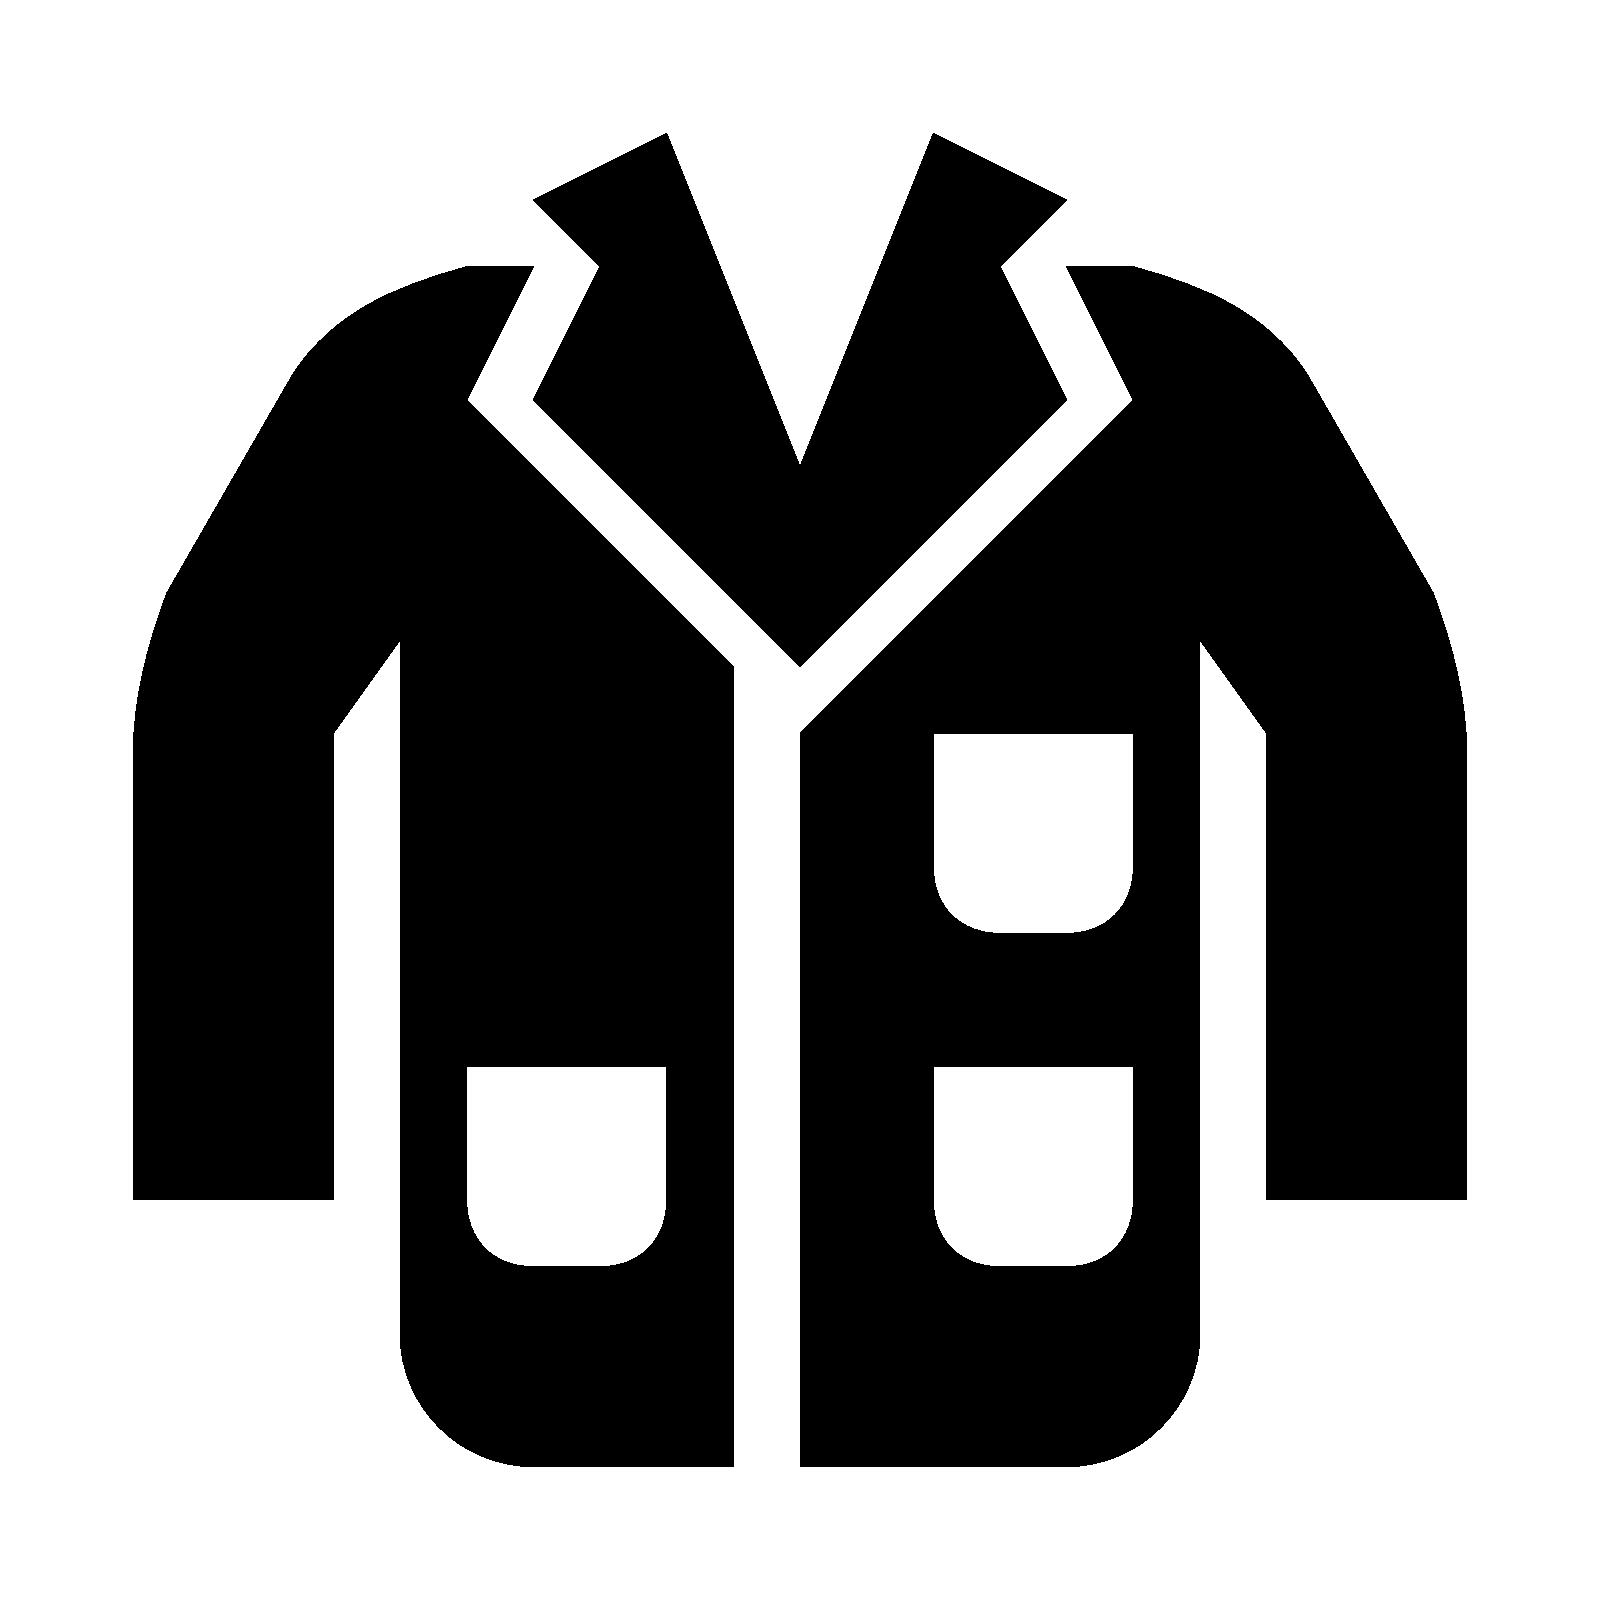 Patient clipart laboratory coat. Lab scientist drawing clamart